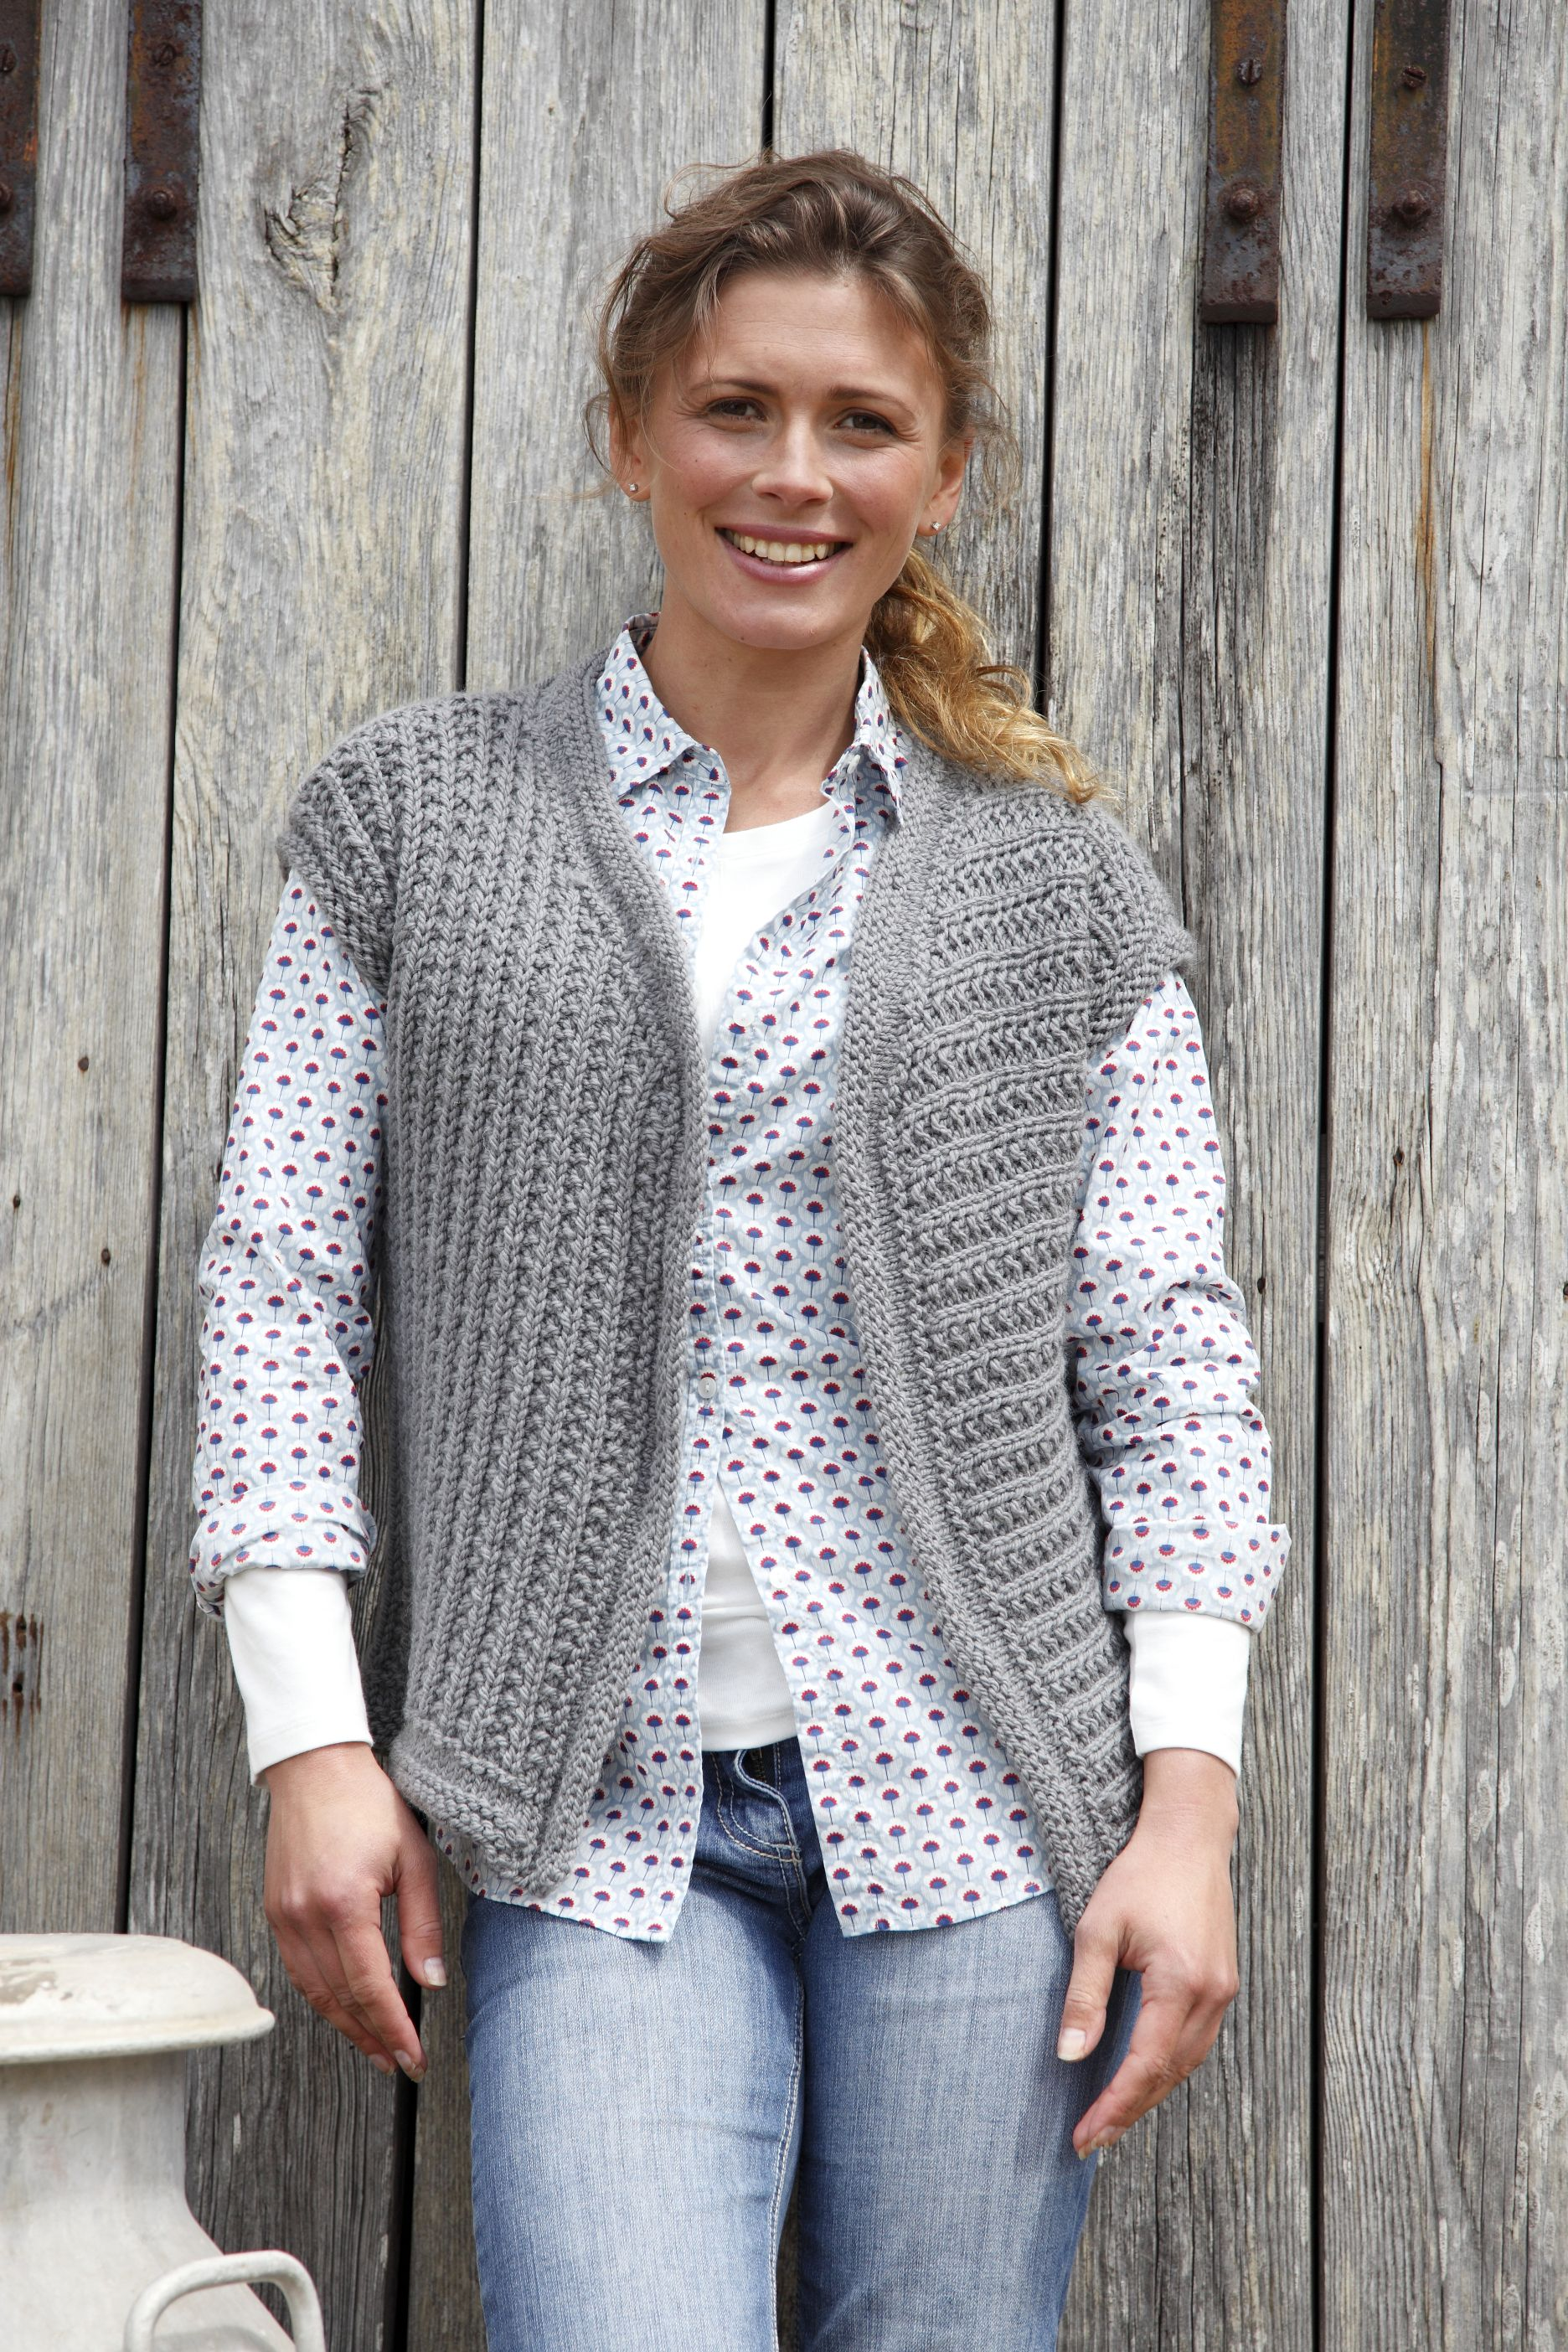 Artesano Ladies Waistcoat   Knitting Patterns   Let's Knit ...